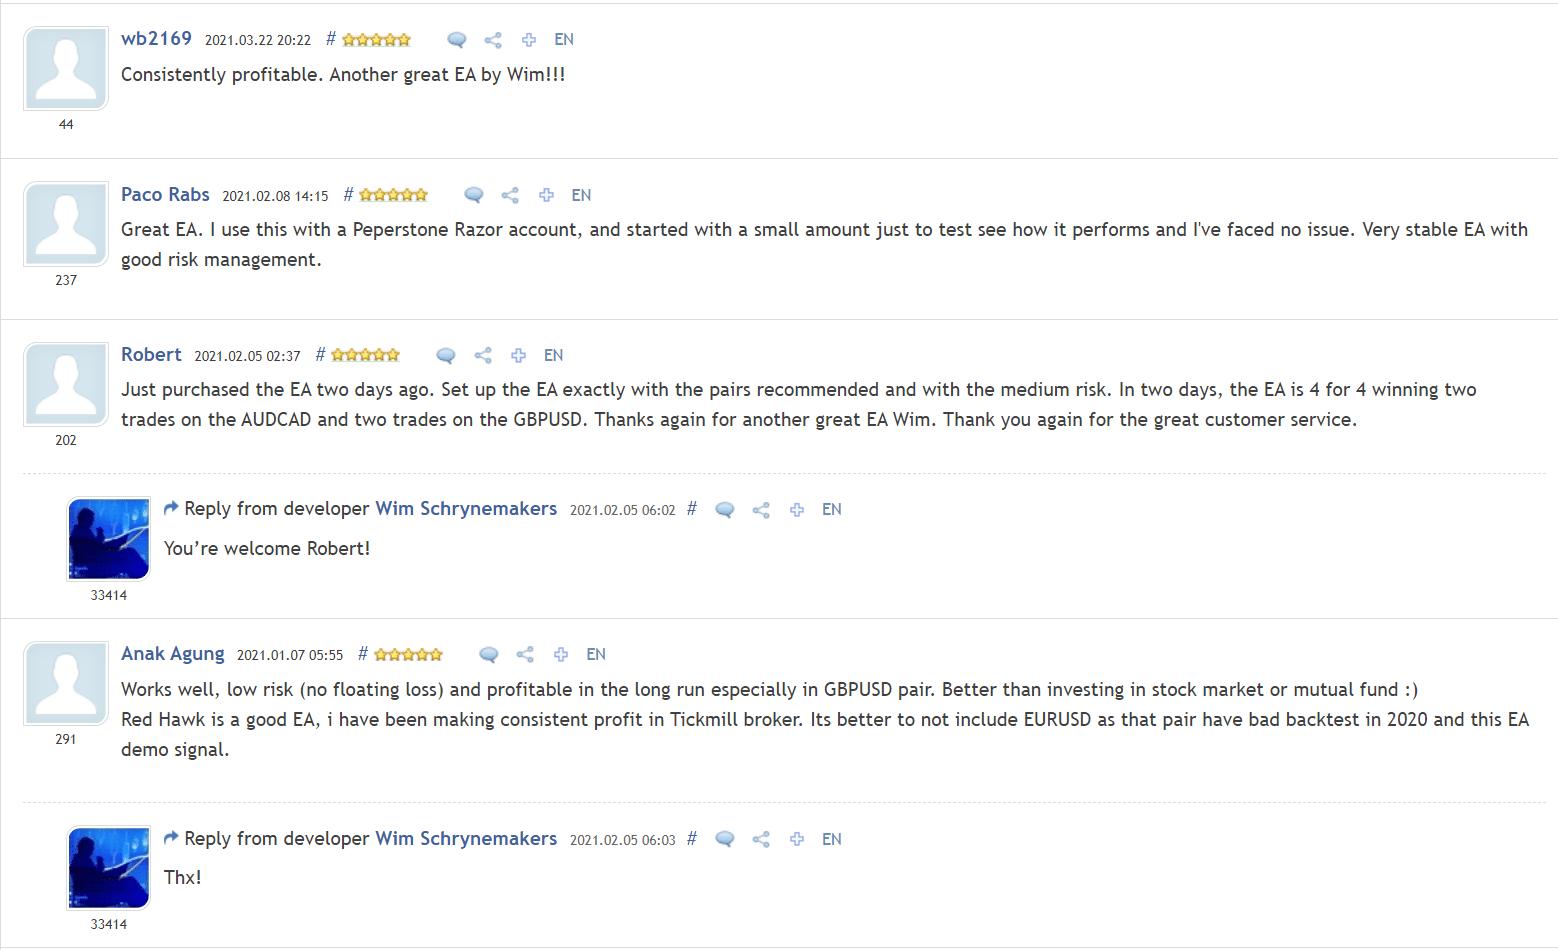 Red Hawk People feedback